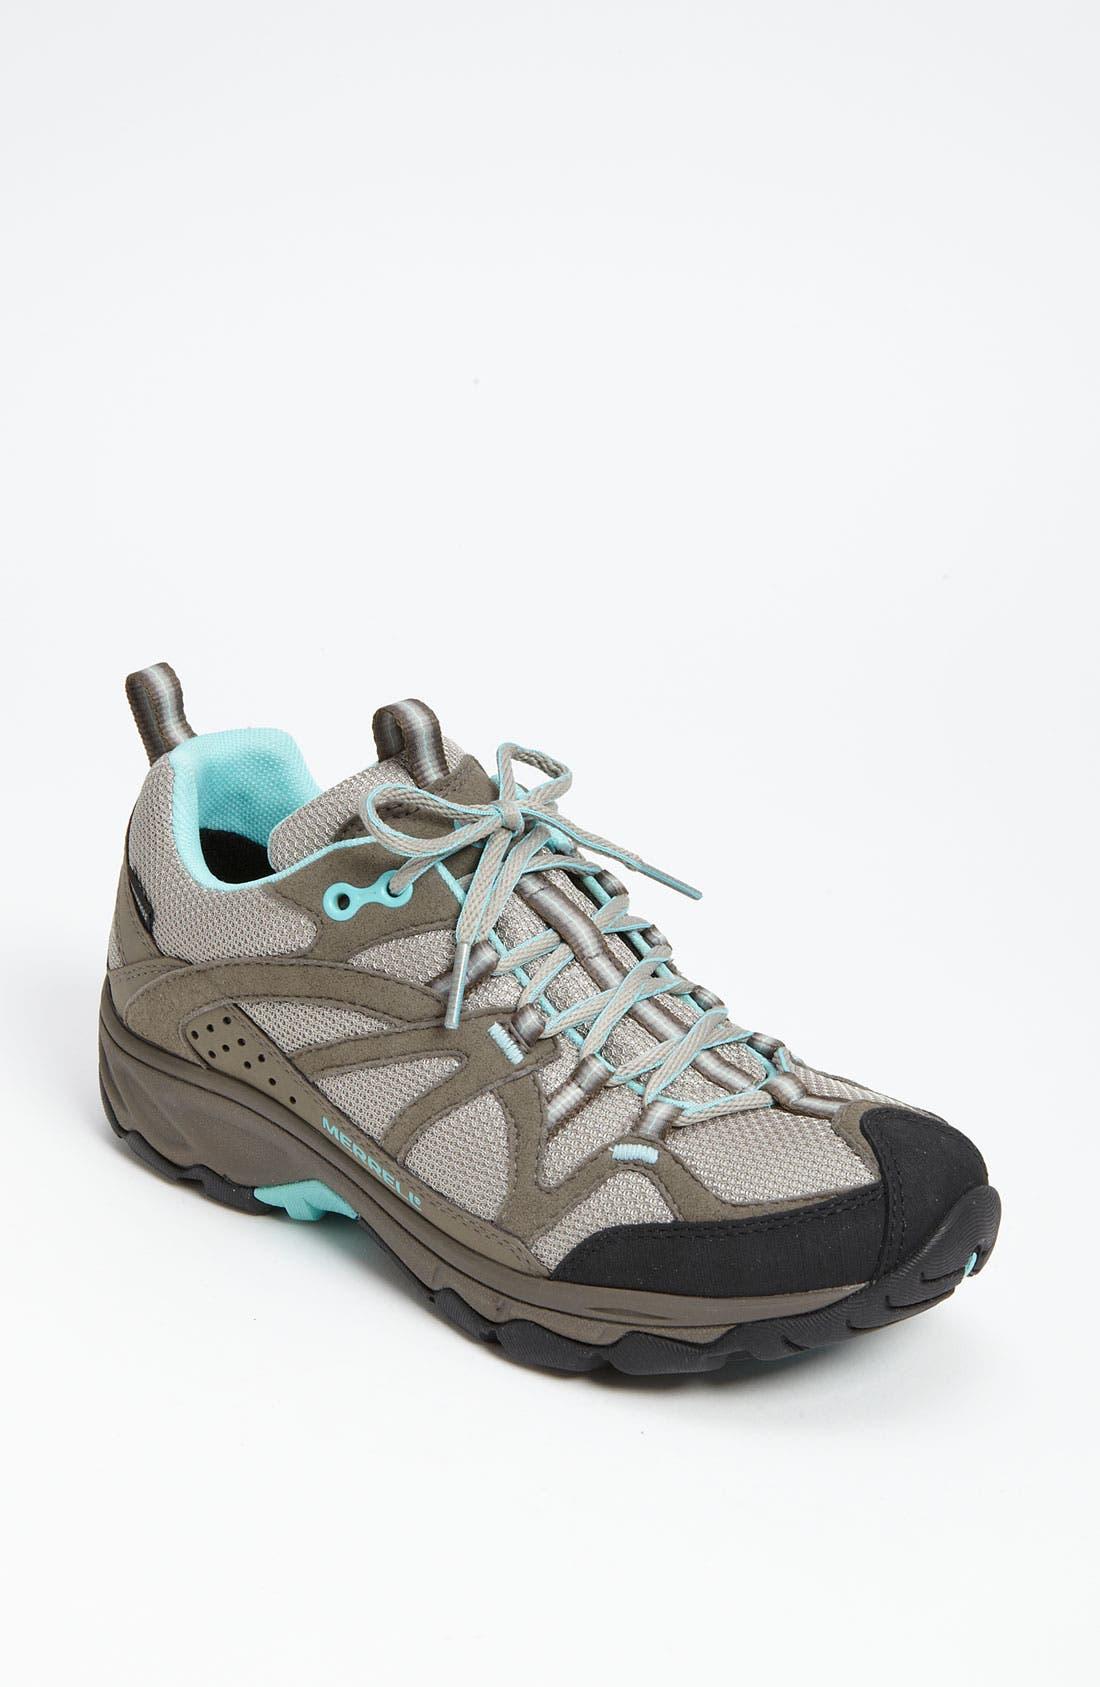 Alternate Image 1 Selected - Merrell 'Calia Waterproof' Hiking Shoe (Women)